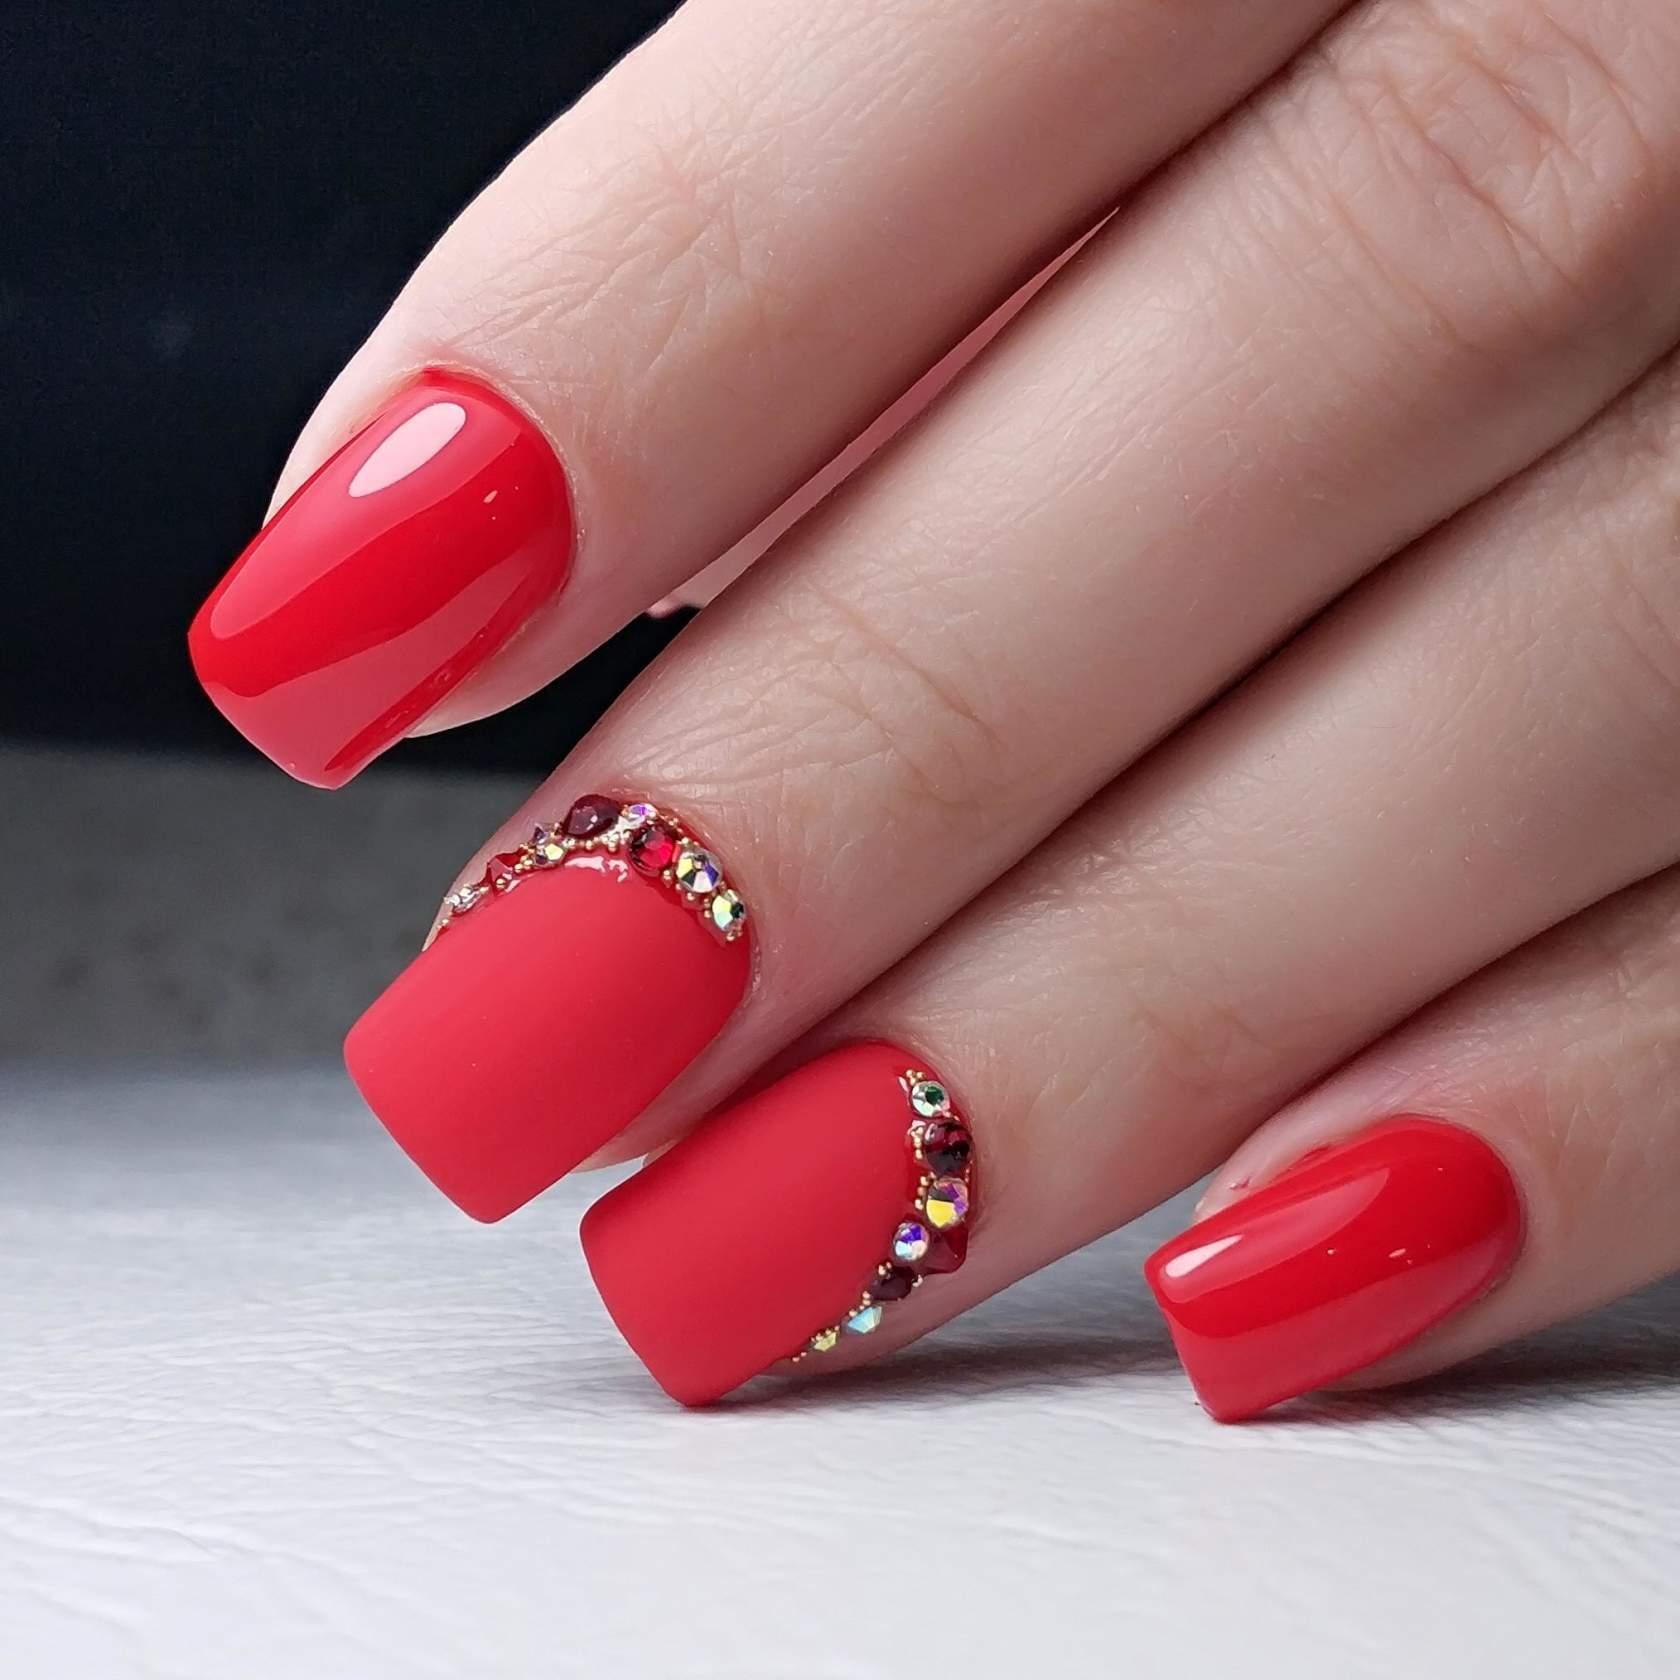 Modny Dizajn Cervenej Manikury Pre Kratke Nechty 2020 Confetissimo Blog Pre Zeny